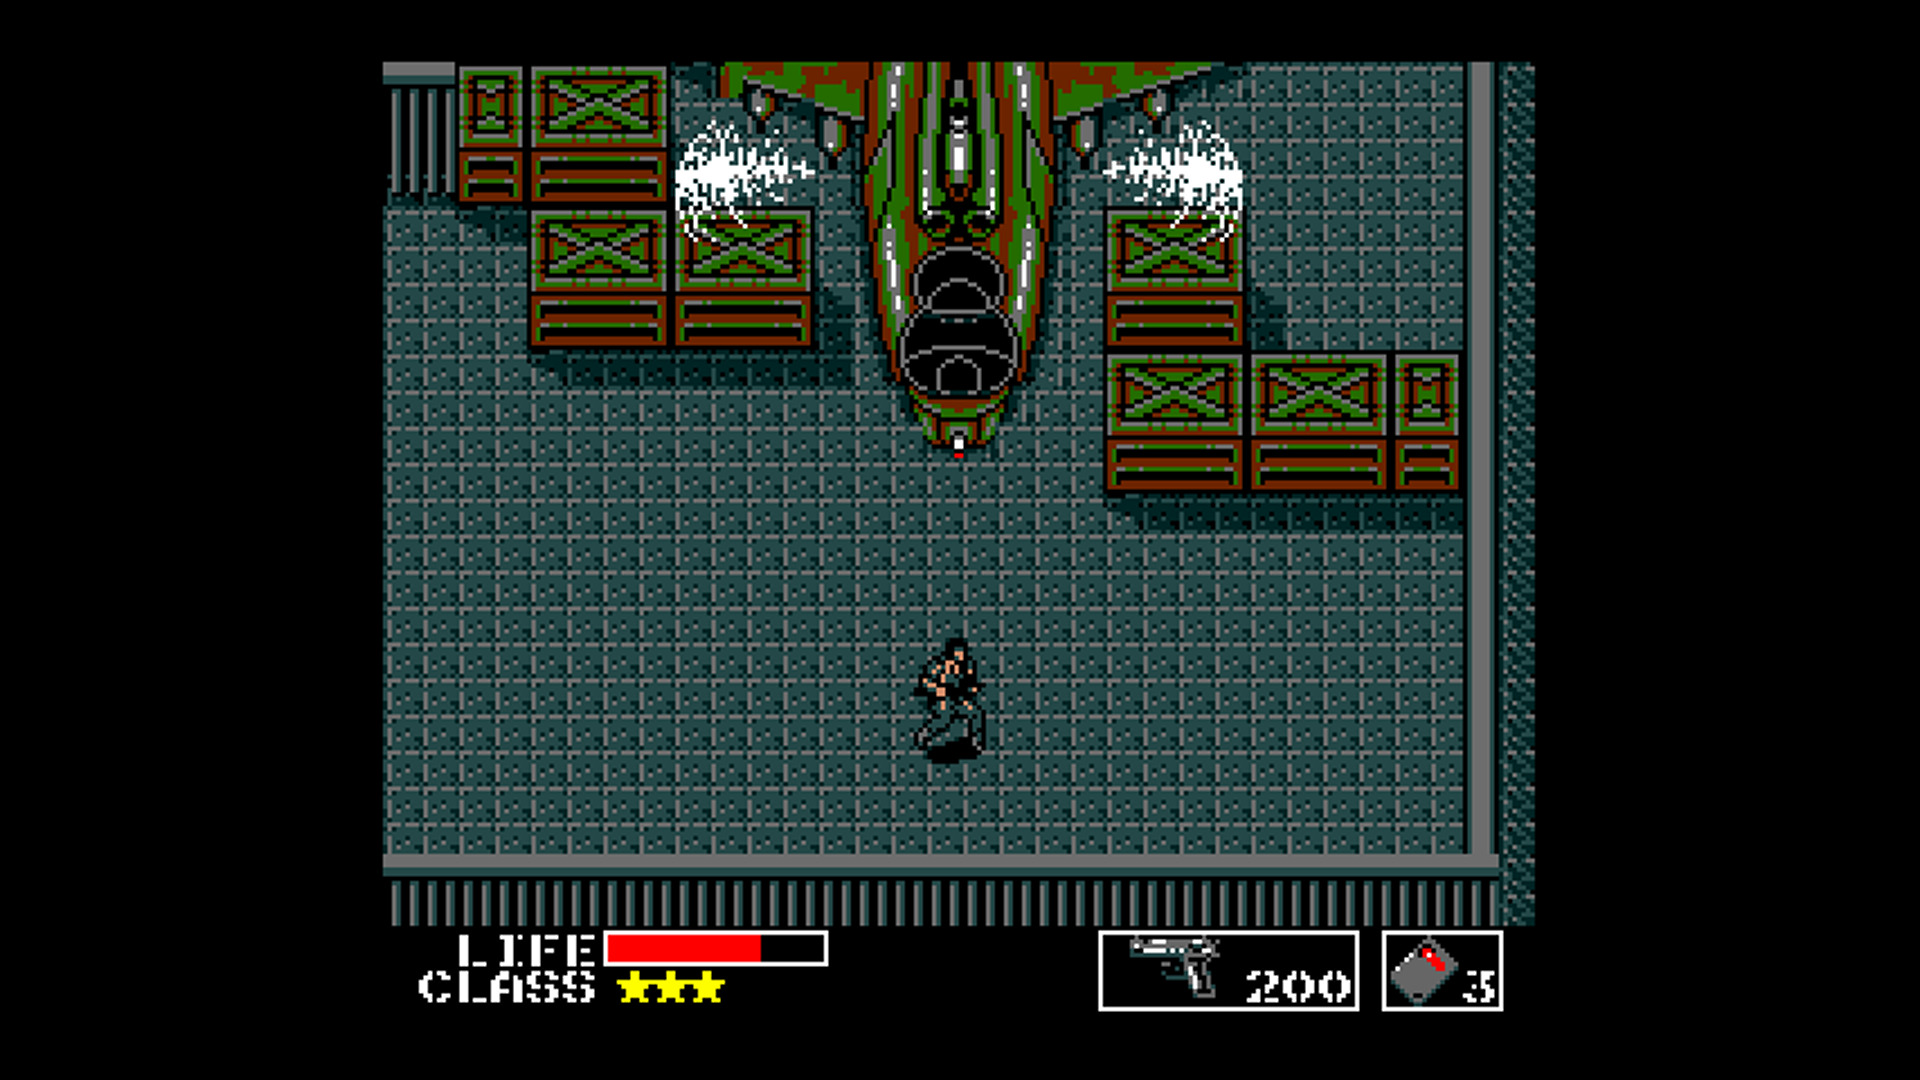 Metal Gear screenshot 2